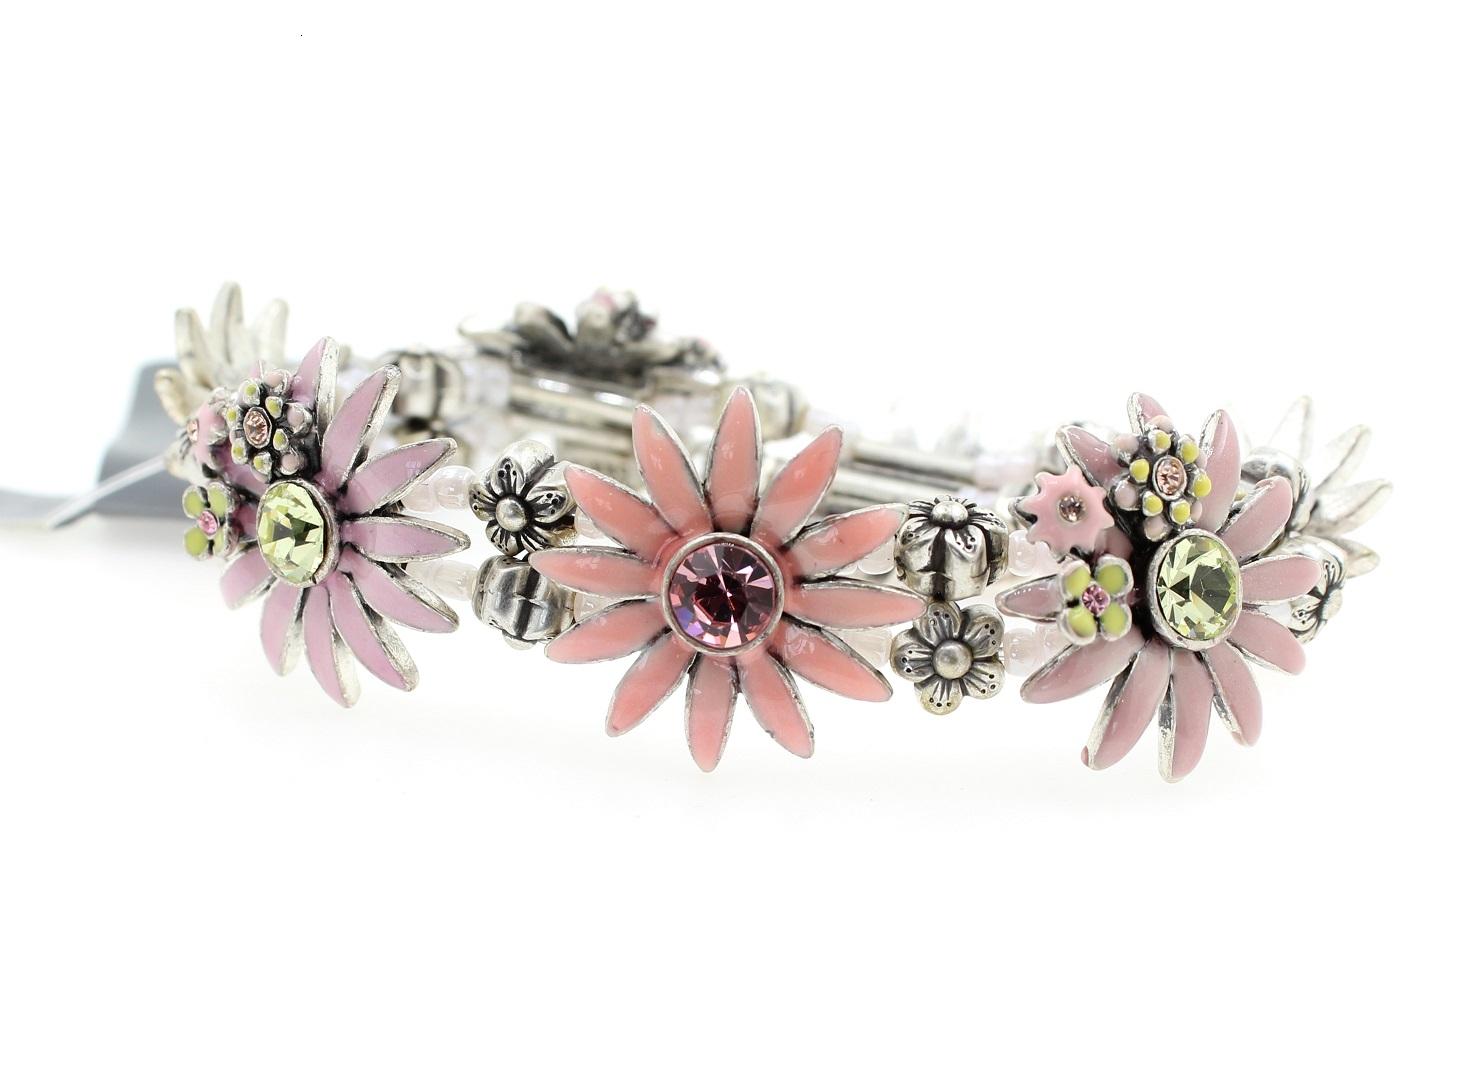 PILGRIM - Daisy - Stretch Bracelet - Oxidised Silver Plate/Pink, Yellow & Purple BNWT